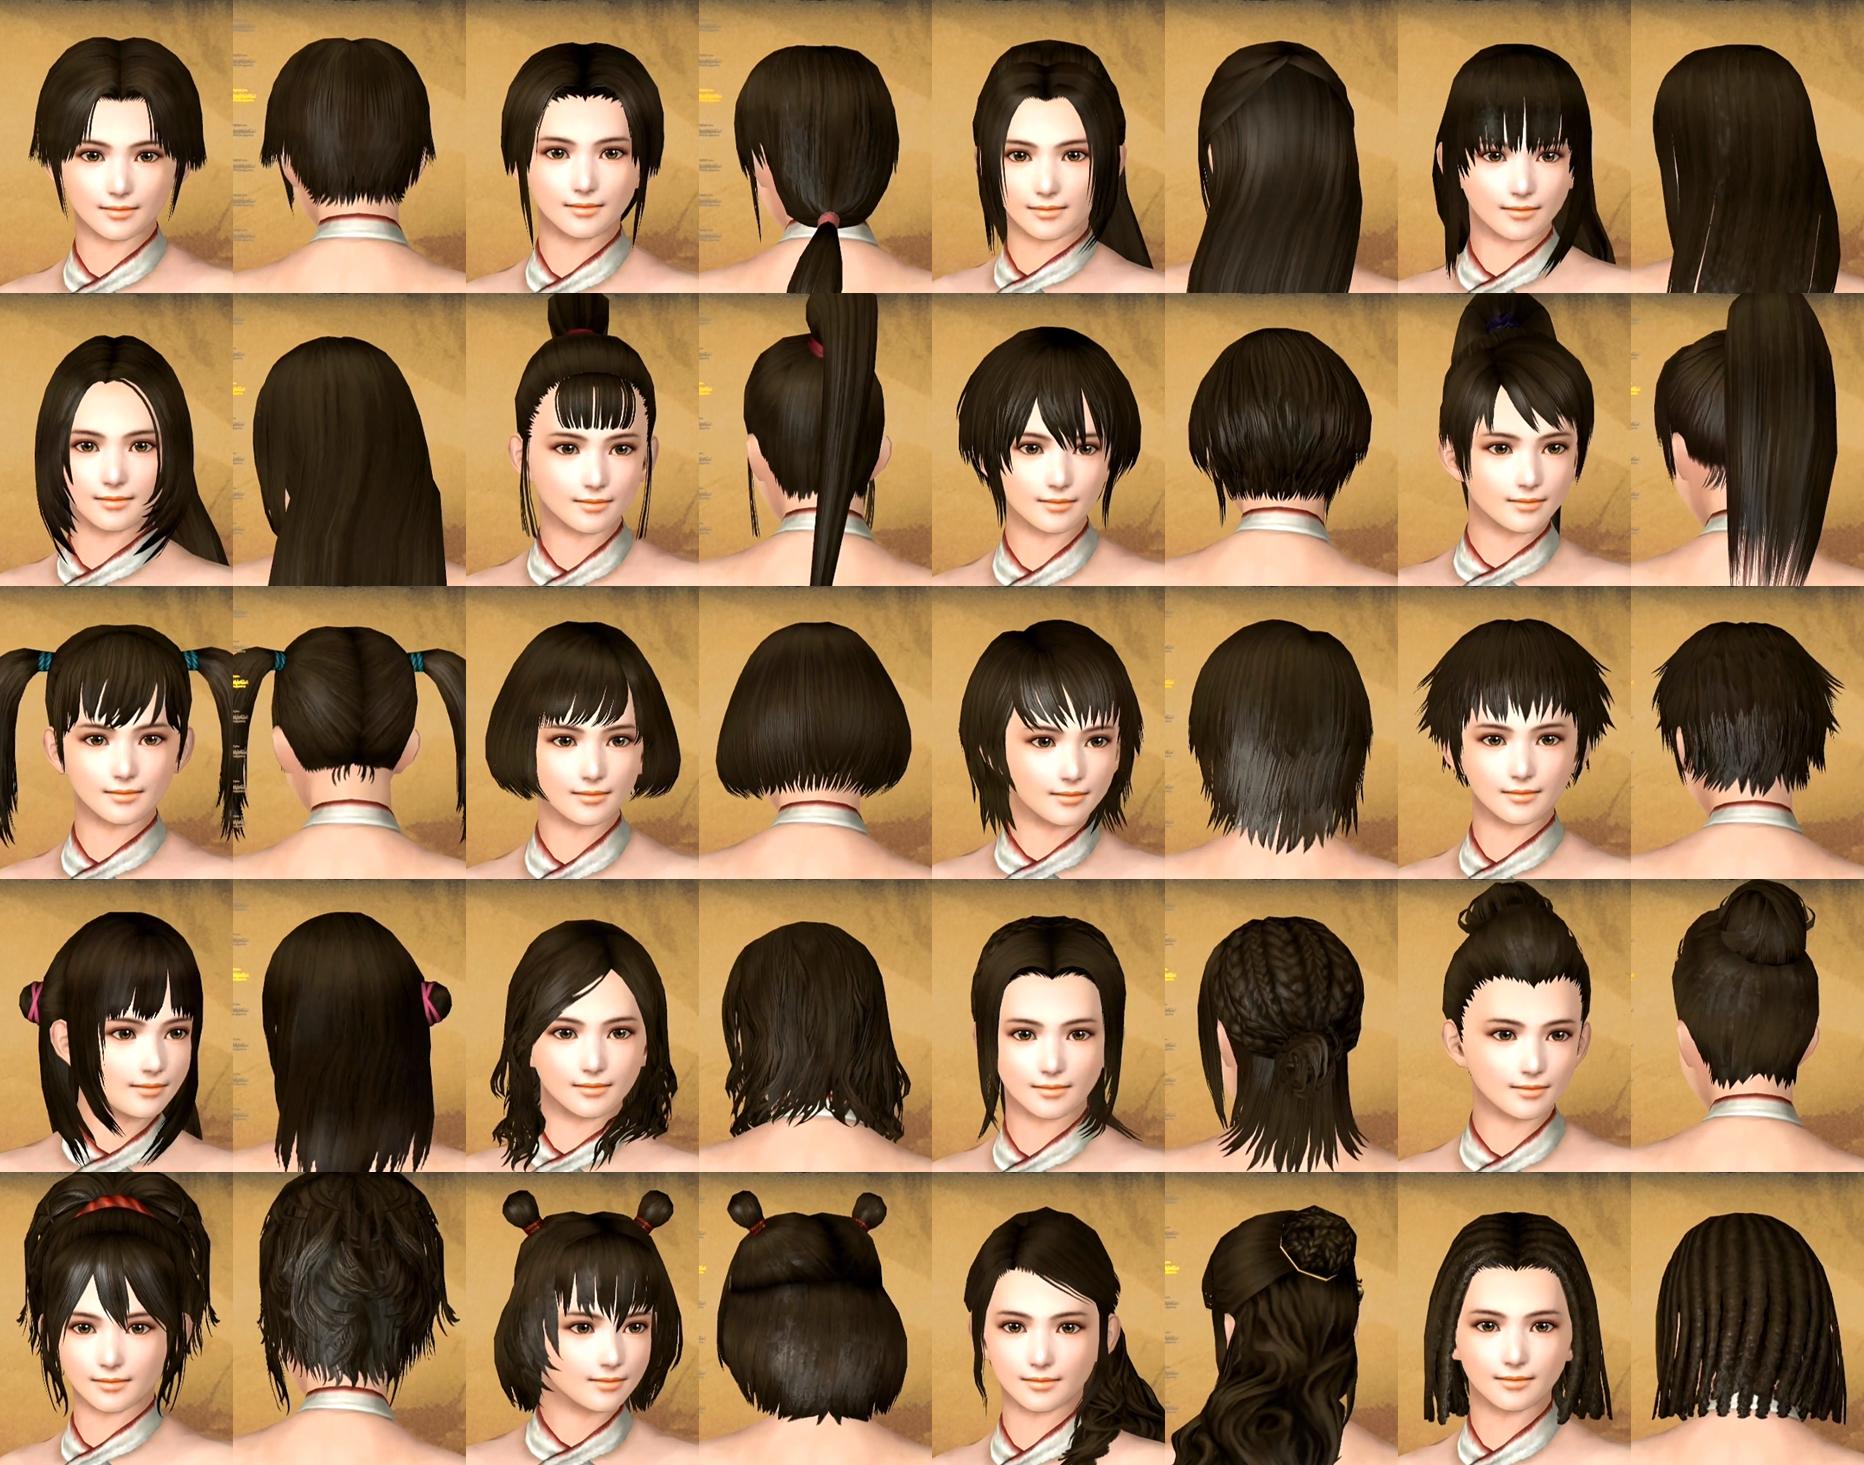 Image Female Hairstyles Tkd Png Koei Wiki Fandom Powered By Wikia